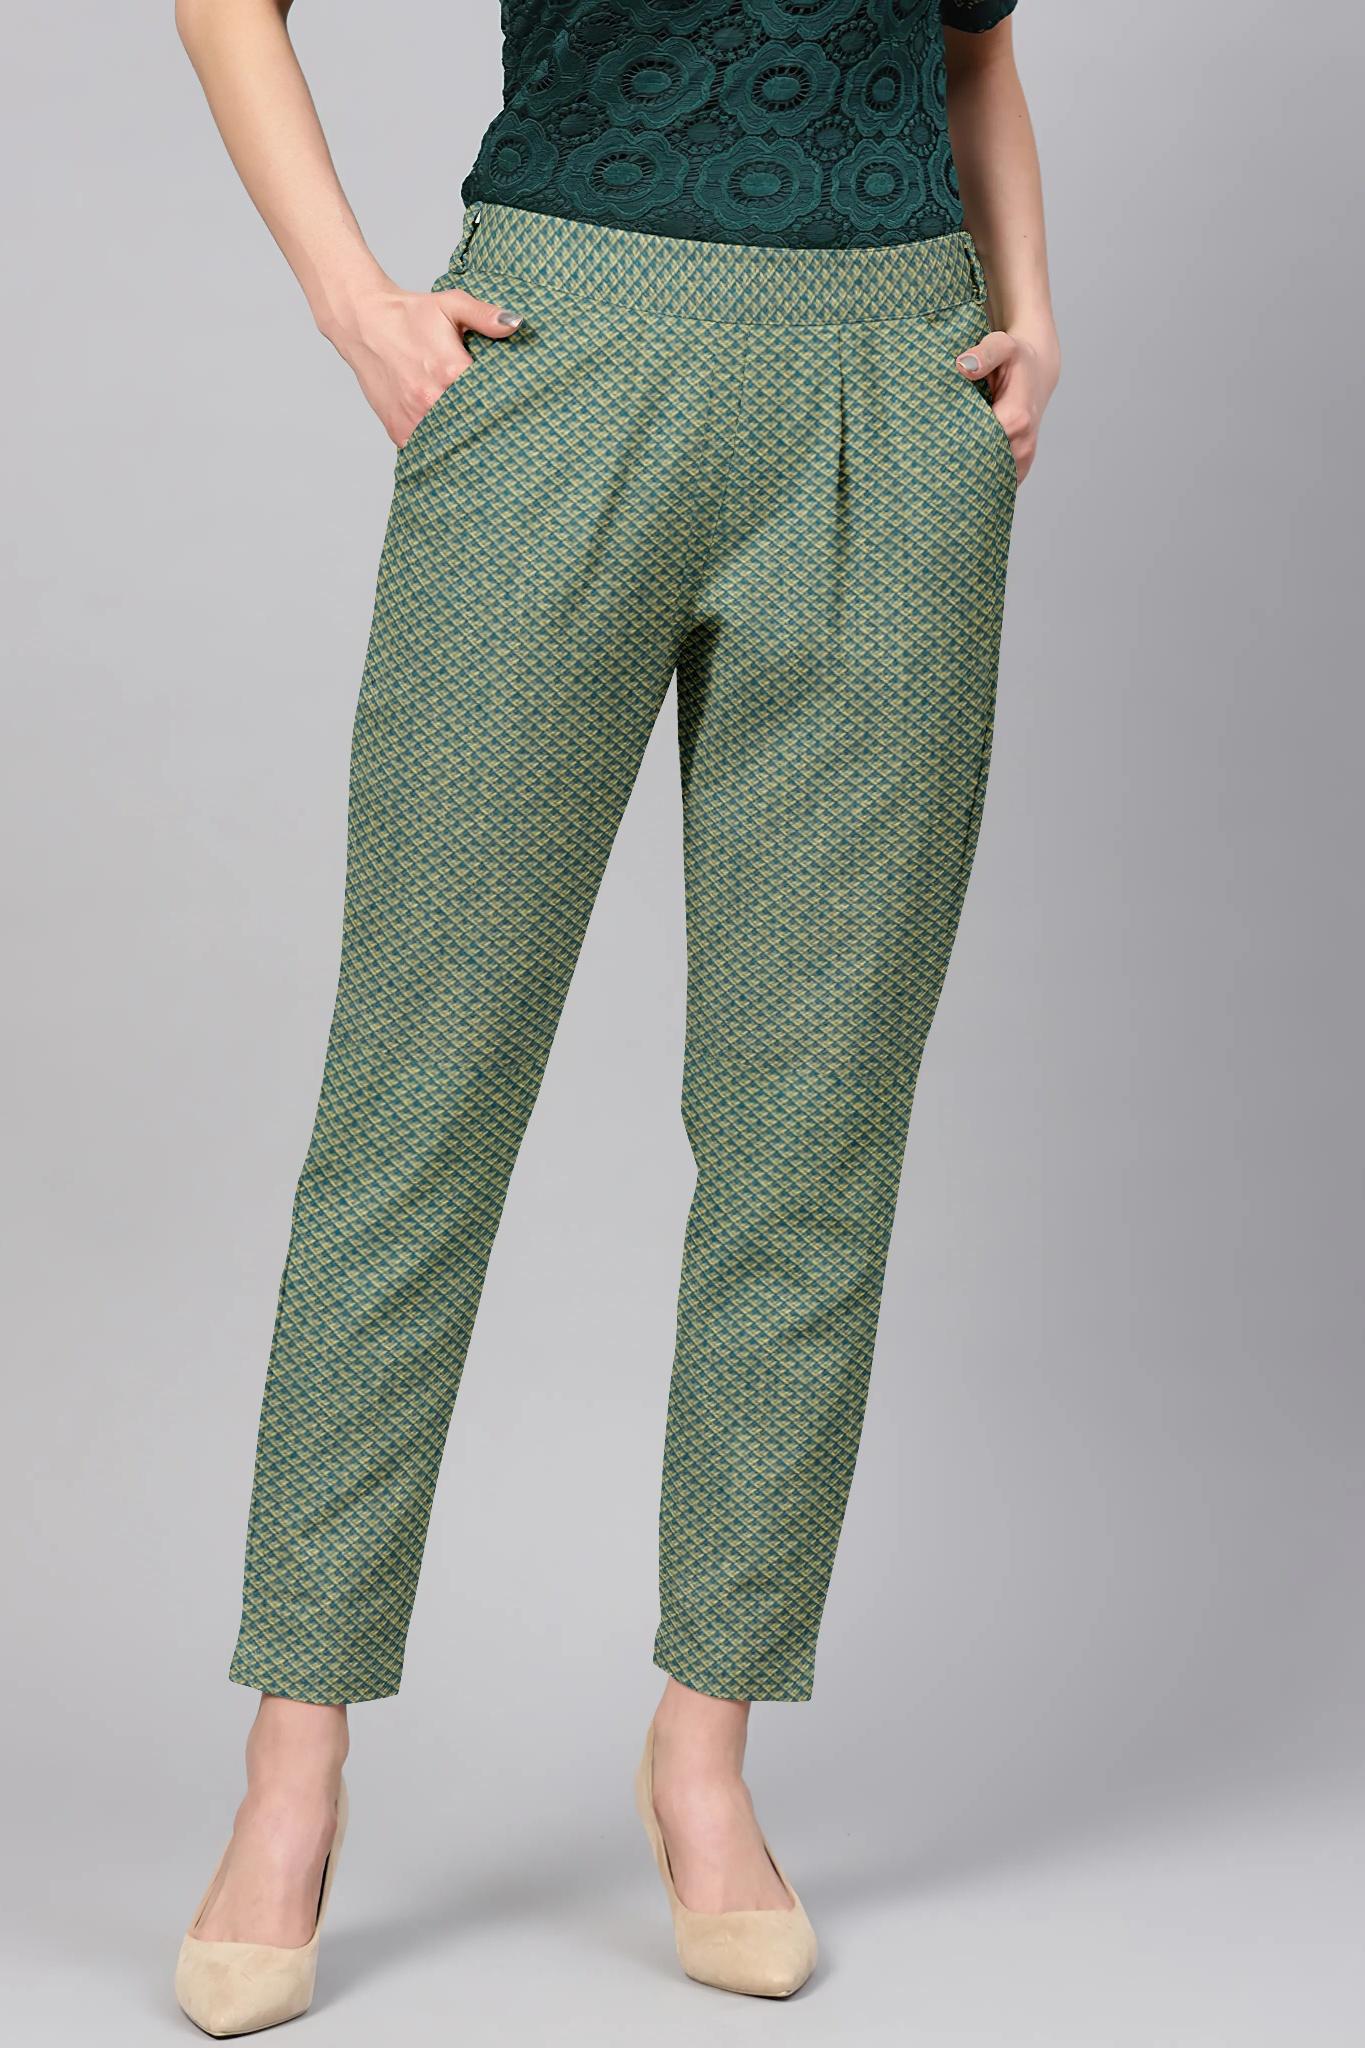 /home/customer/www/fabartcraft.com/public_html/uploadshttps://www.shopolics.com/uploads/images/medium/Green-Cream-Cotton-Polka-Regular-Fit-Solid-Trouser-36078.jpg